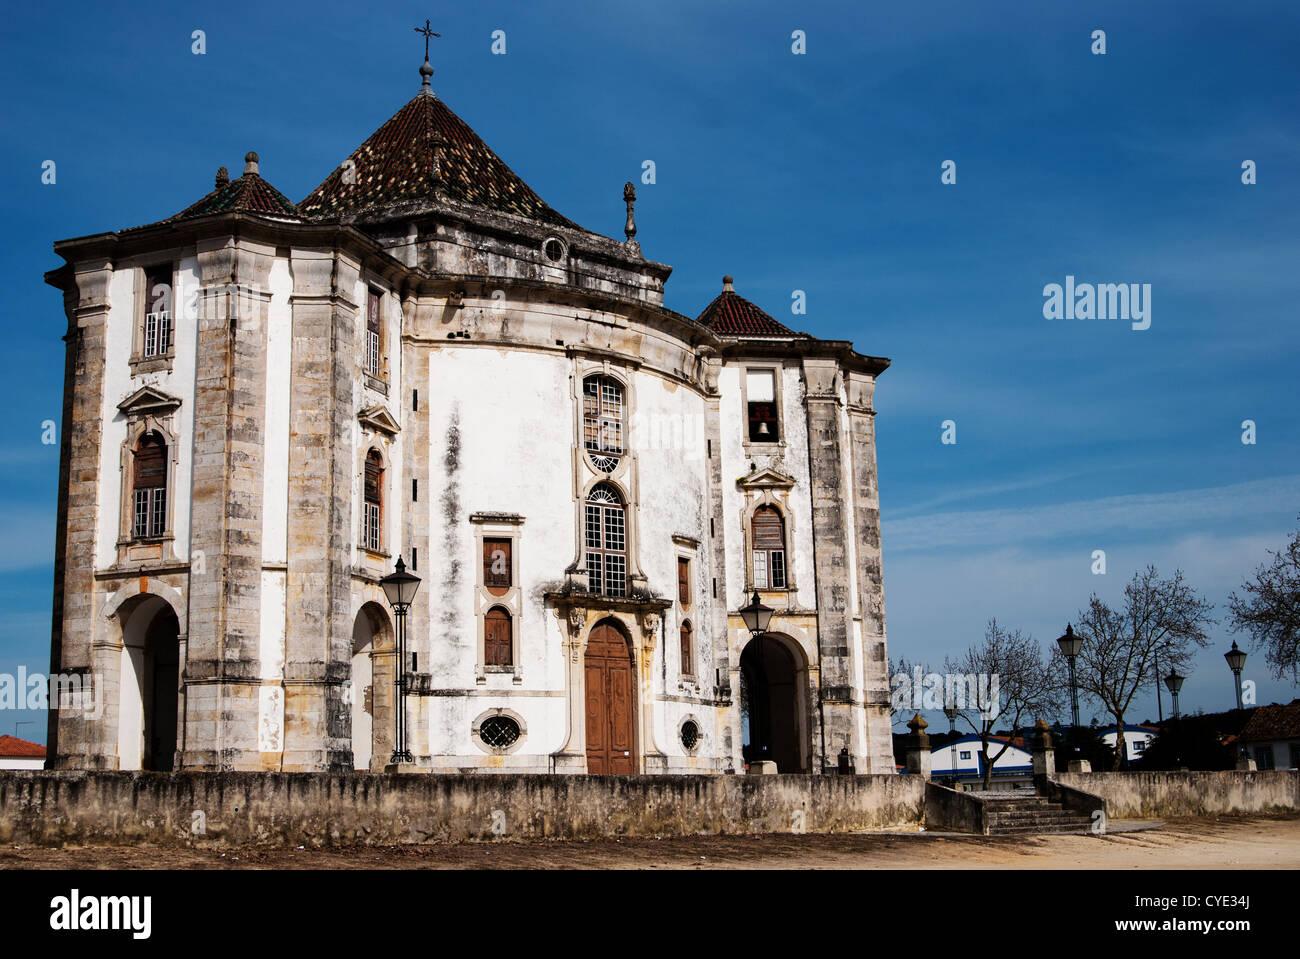 Senhor Jesus da Pedra, Obidos, Portugal: Beautiful hexagonal shape church - Stock Image